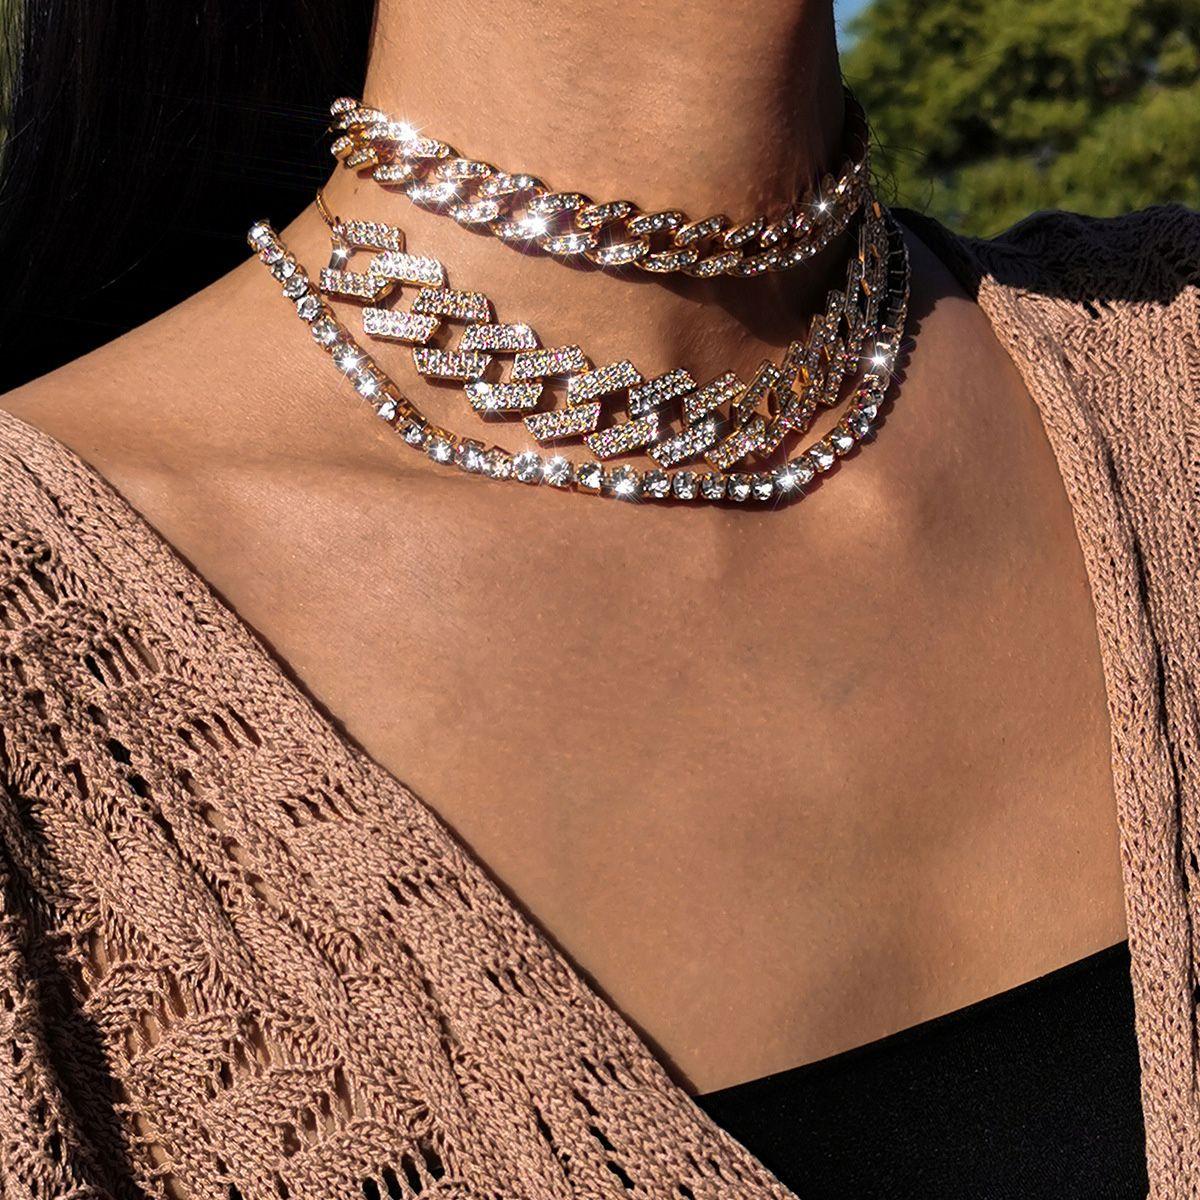 ookjewelry wholesale Multi-layer Full Diamond Necklace Chokers